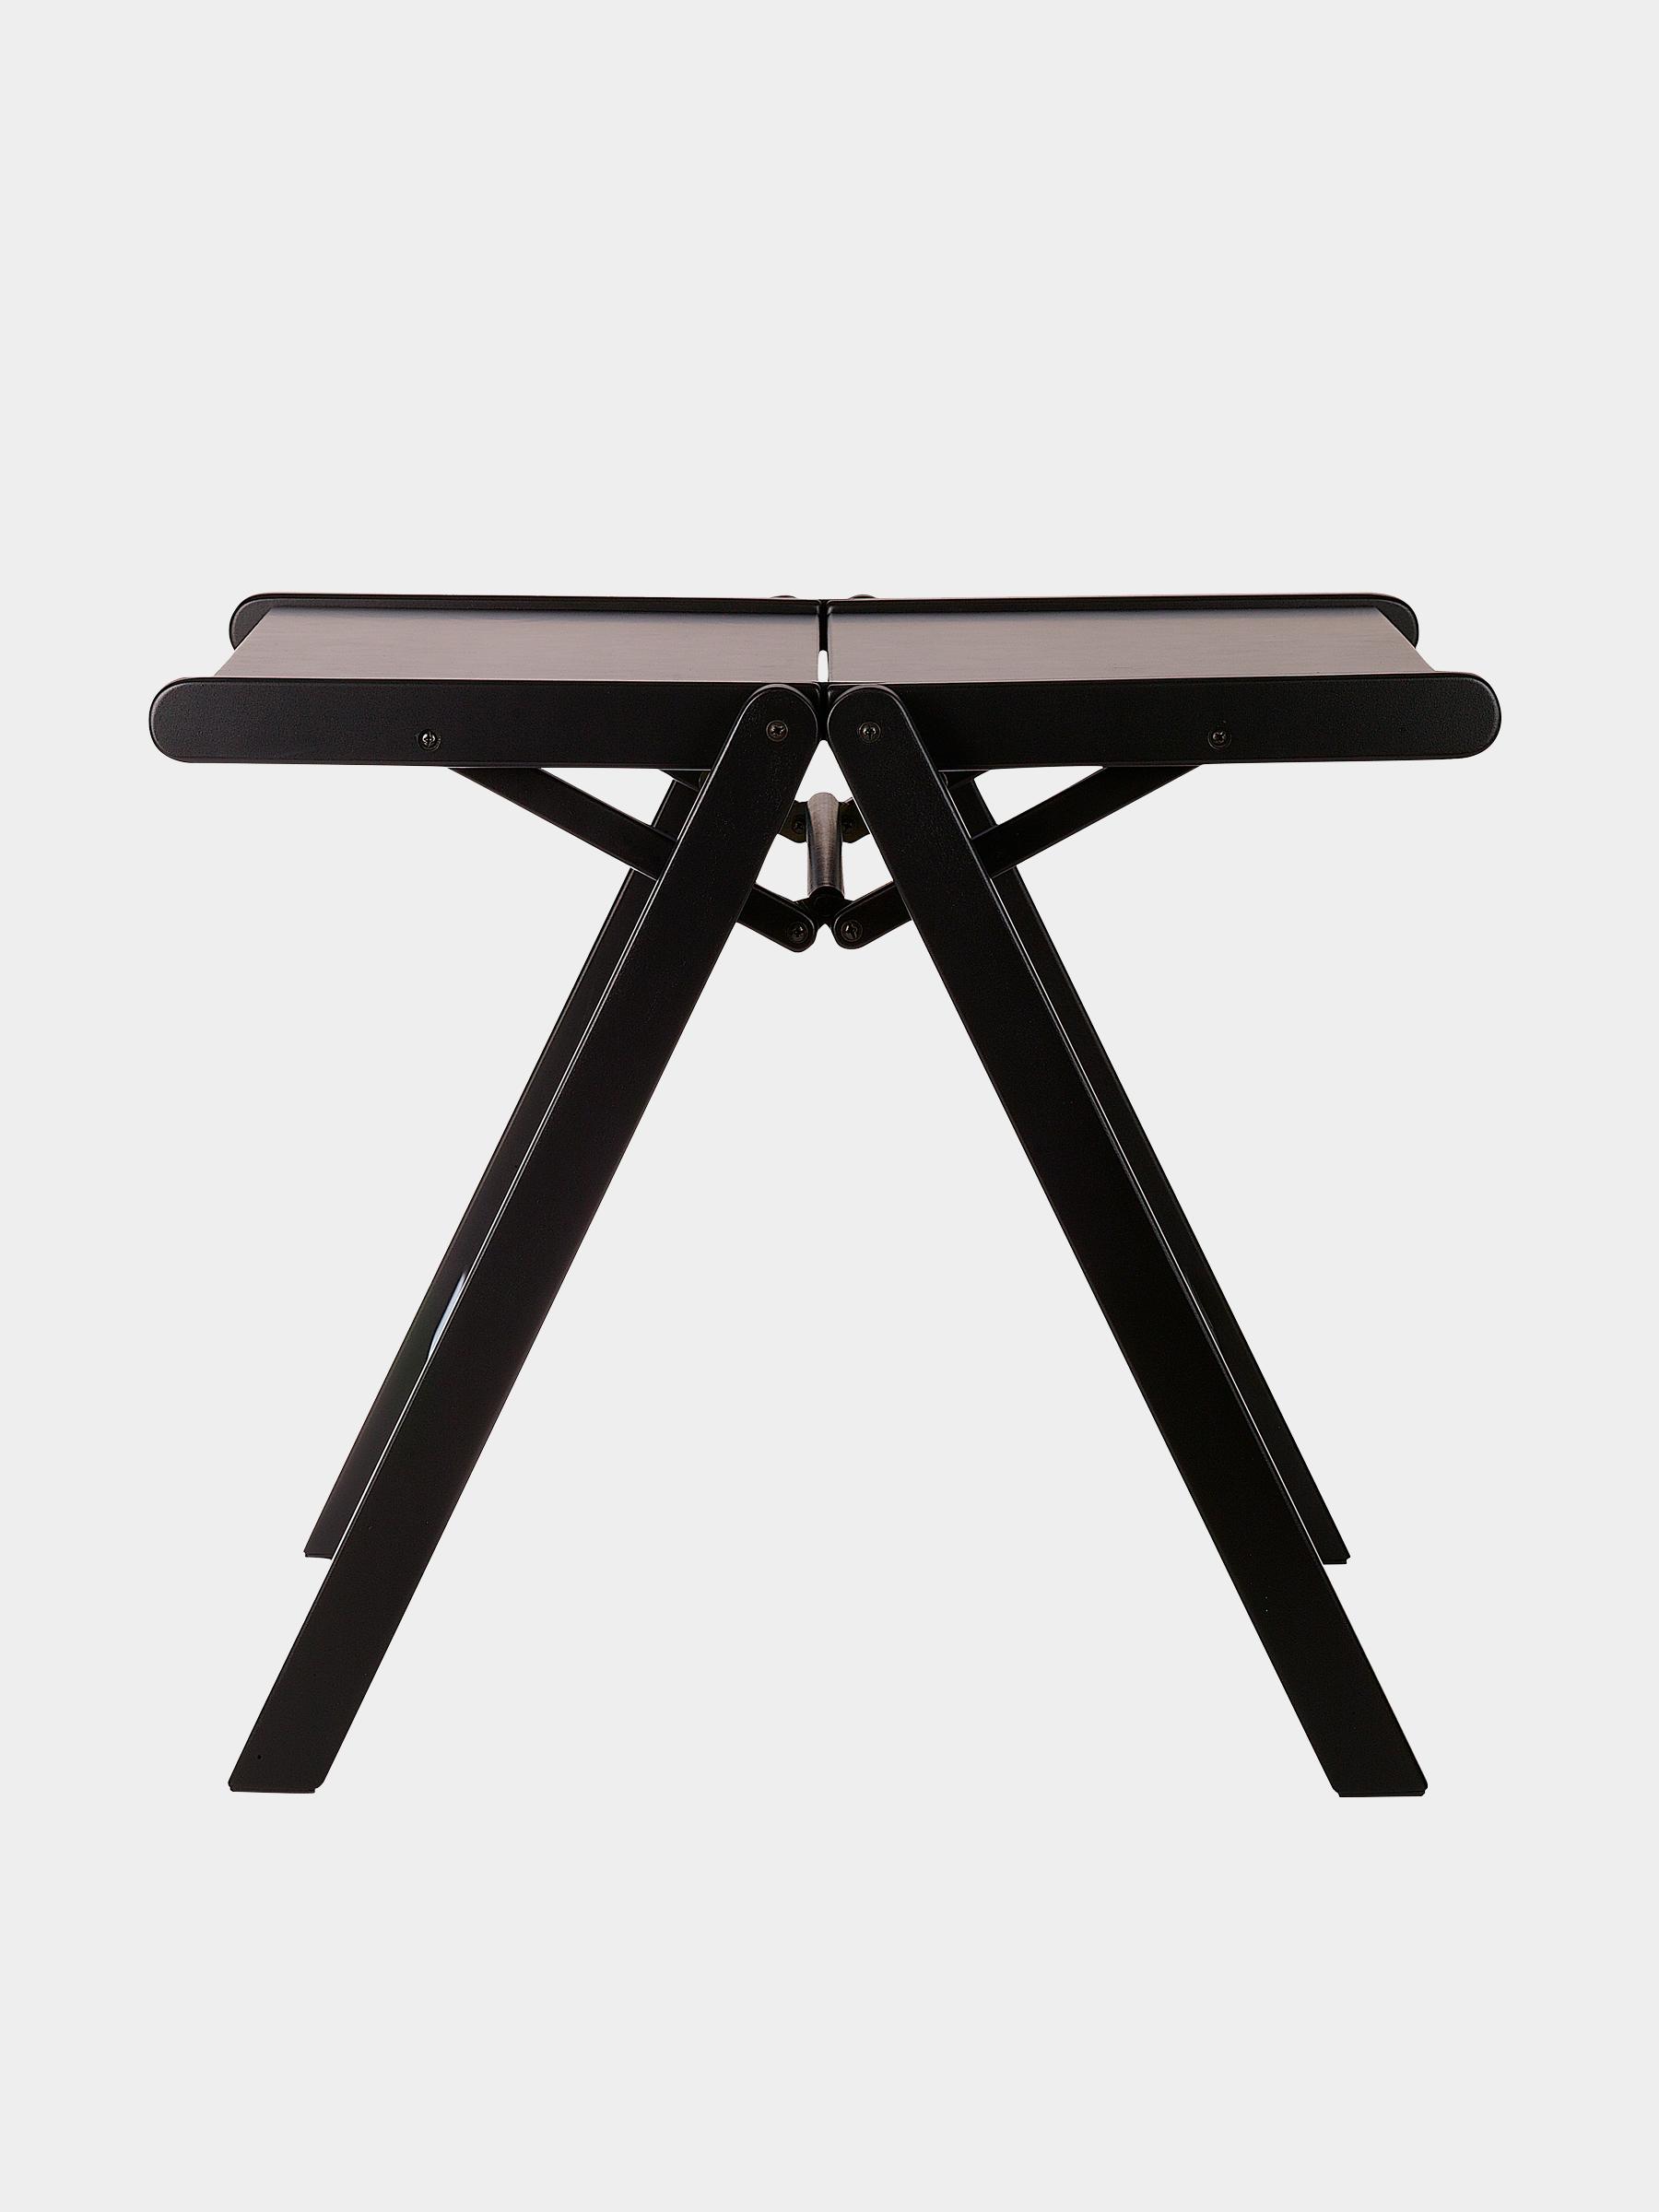 Rex_Kralj_coffee_table_black